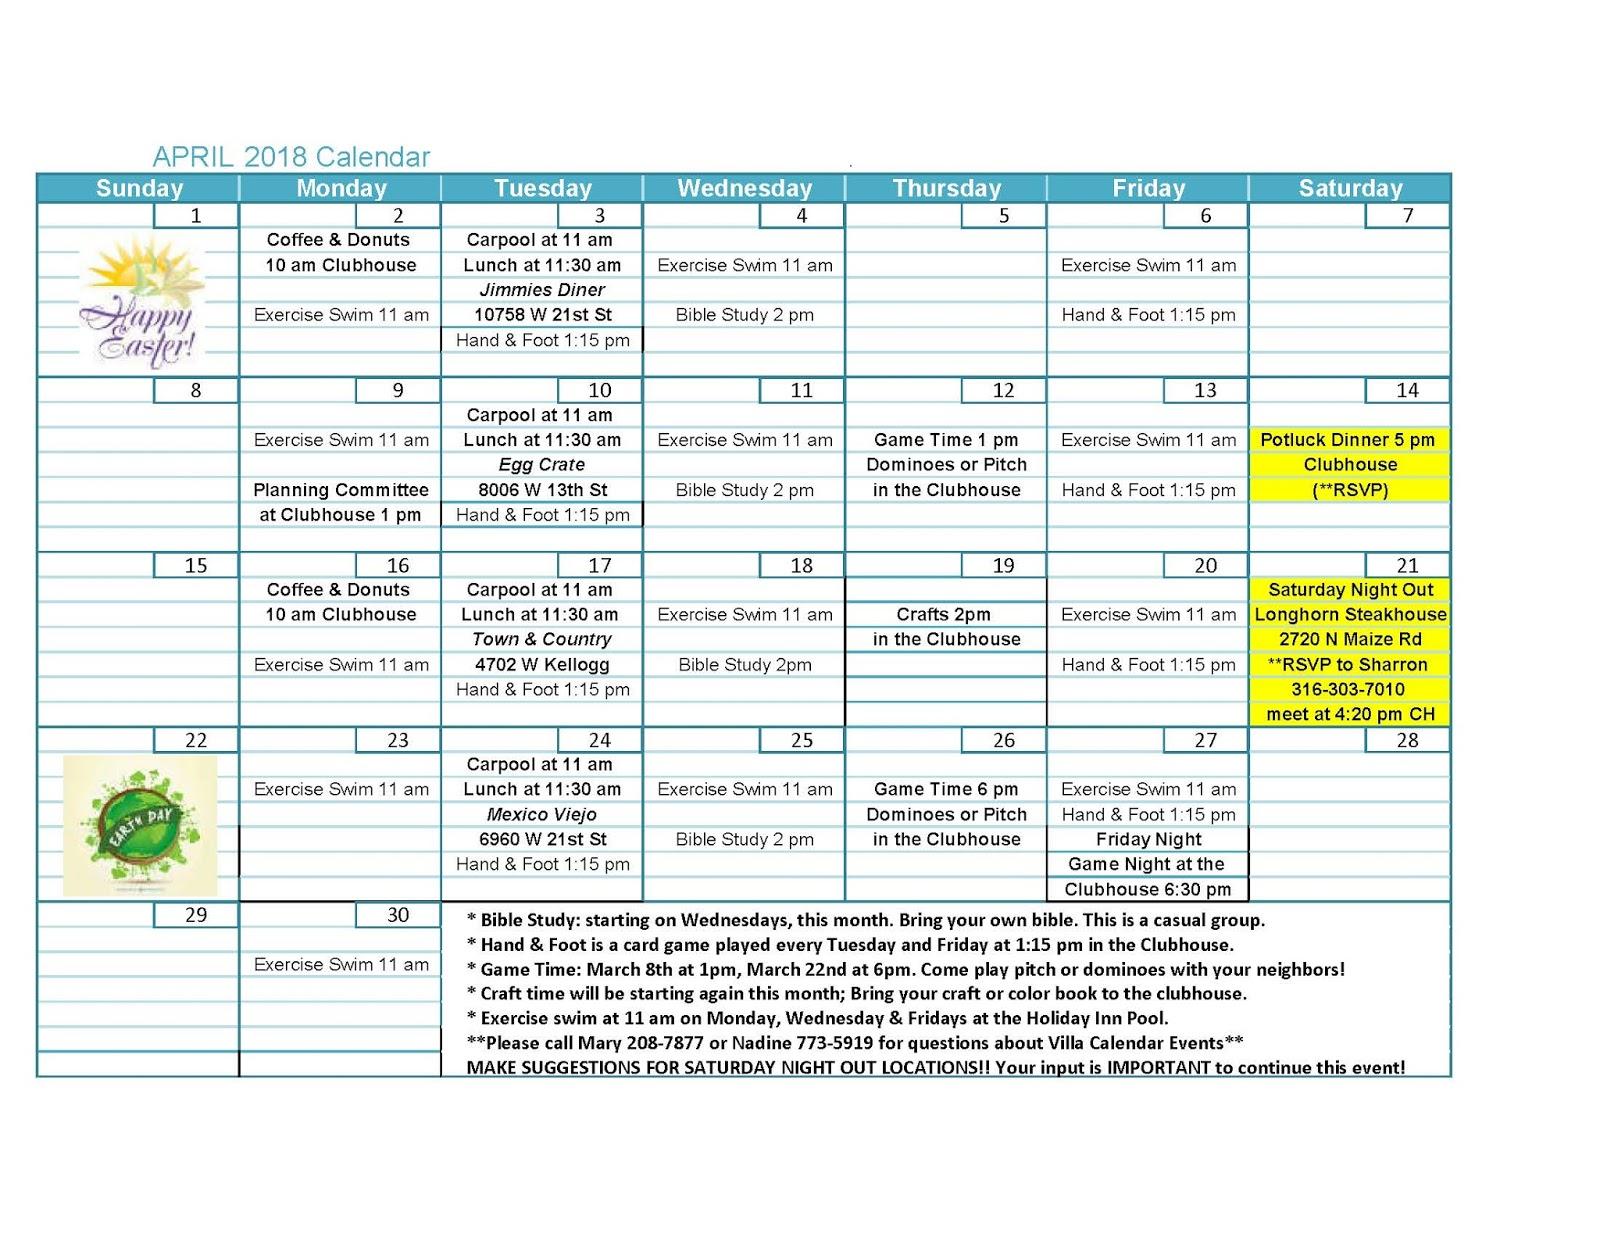 Prudentia Property Management | Wichita, KS, Maize, KS